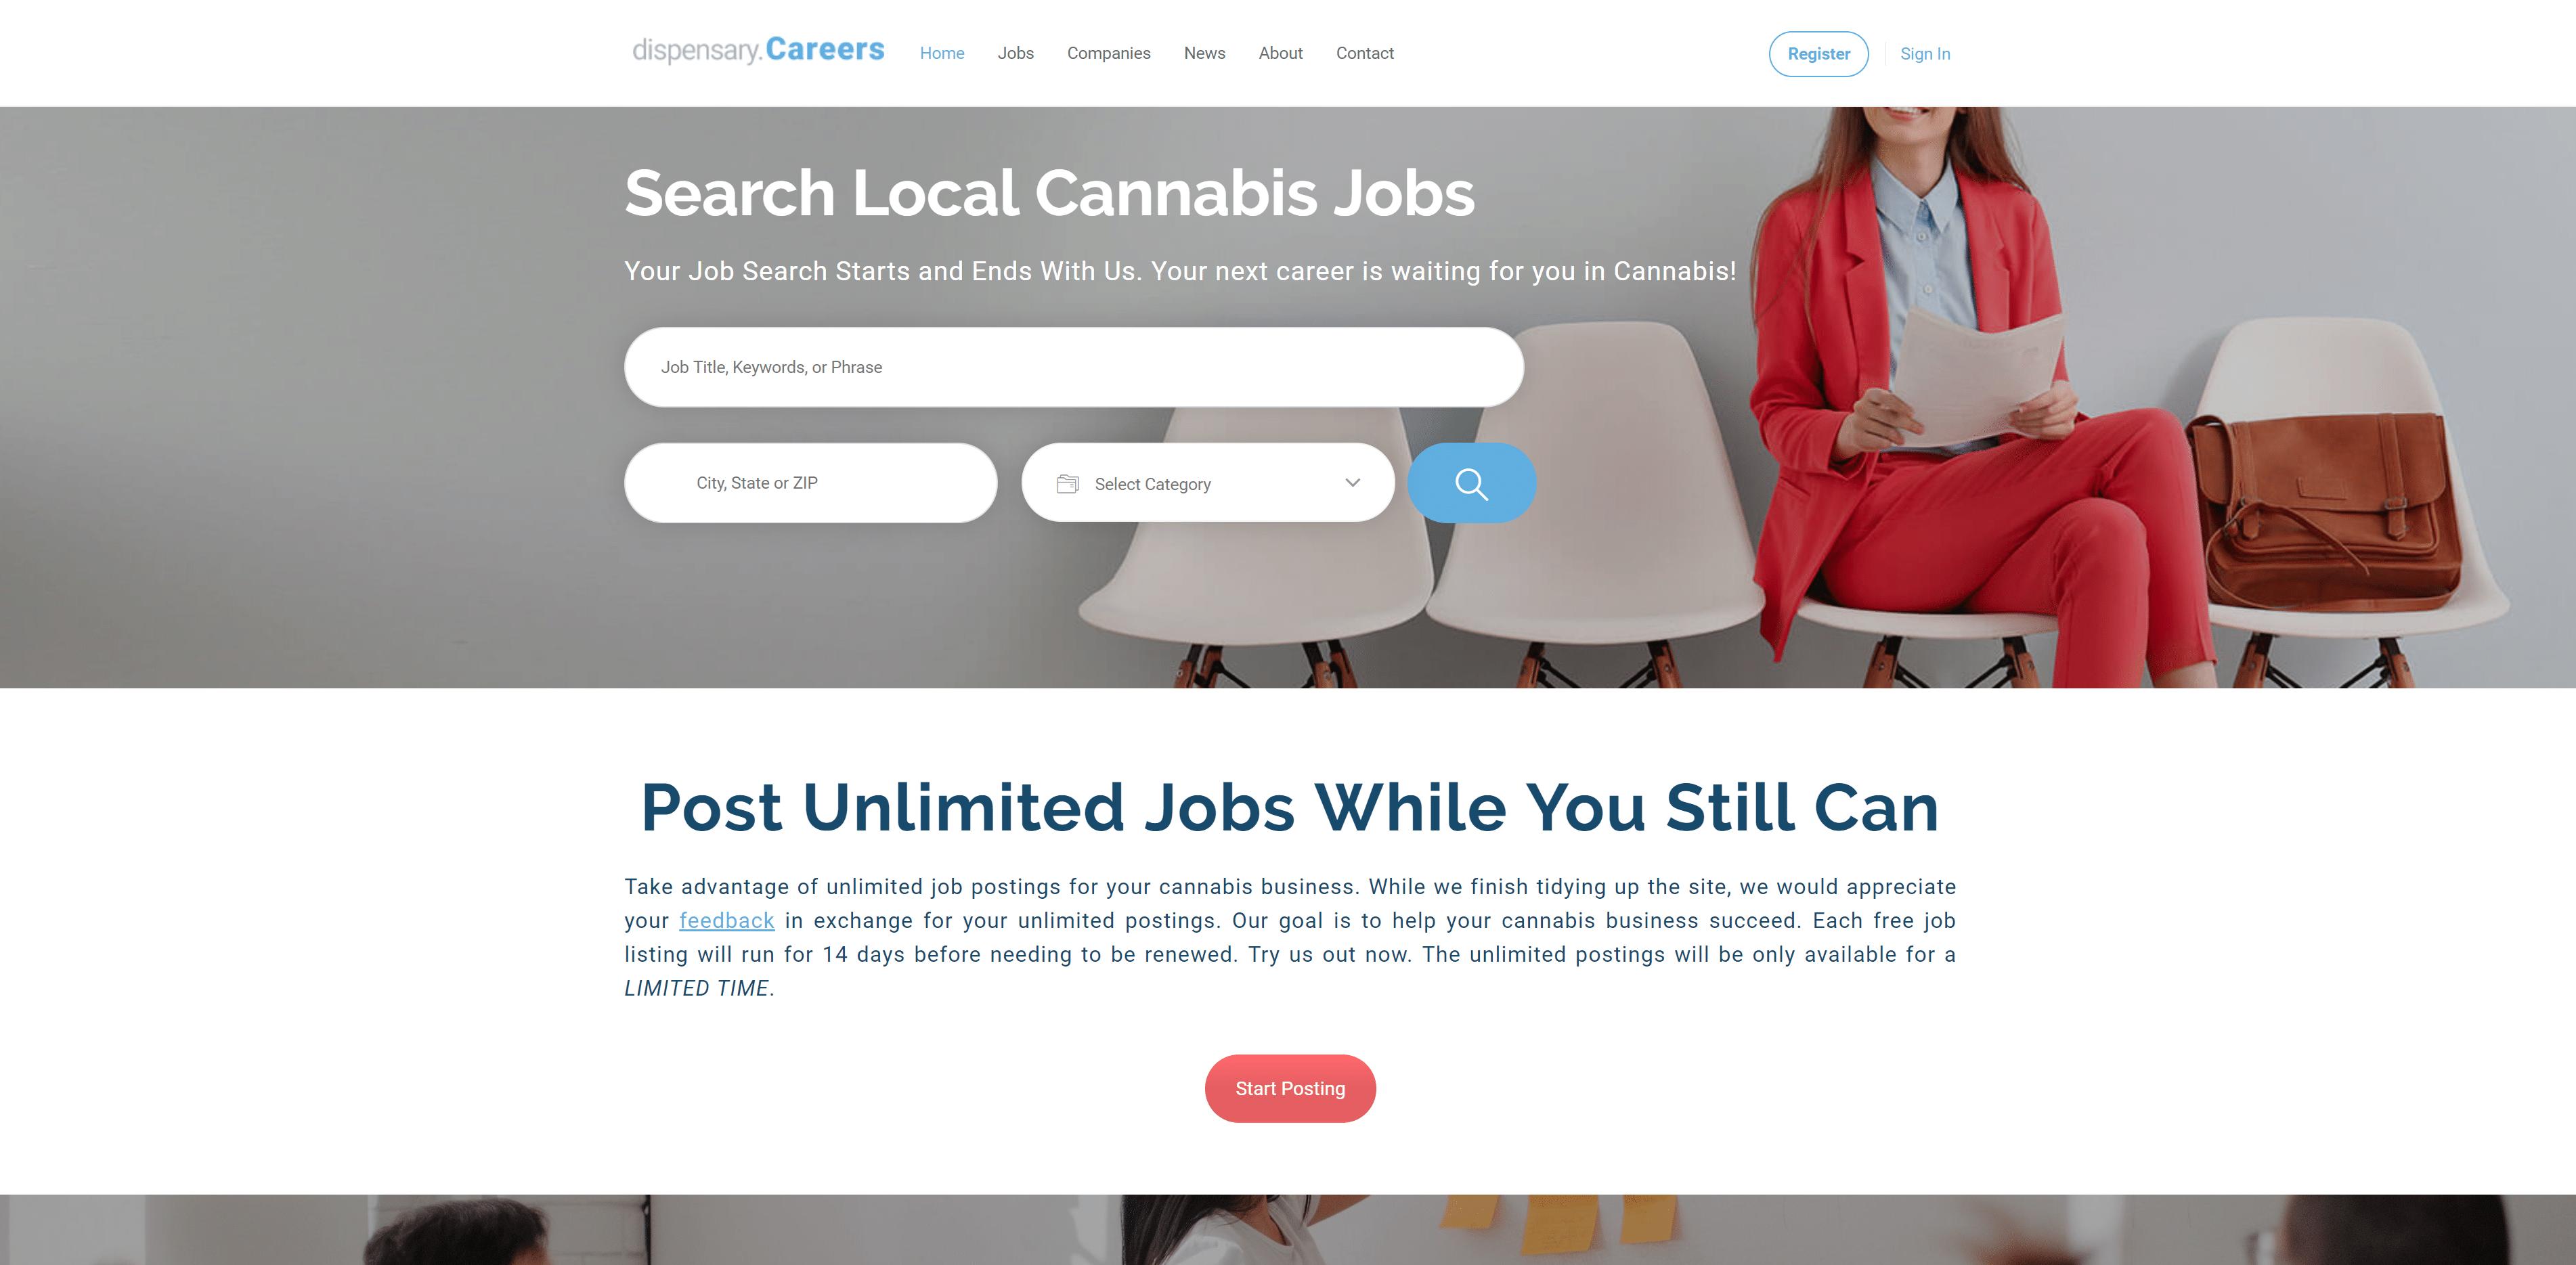 Dispensary Careers